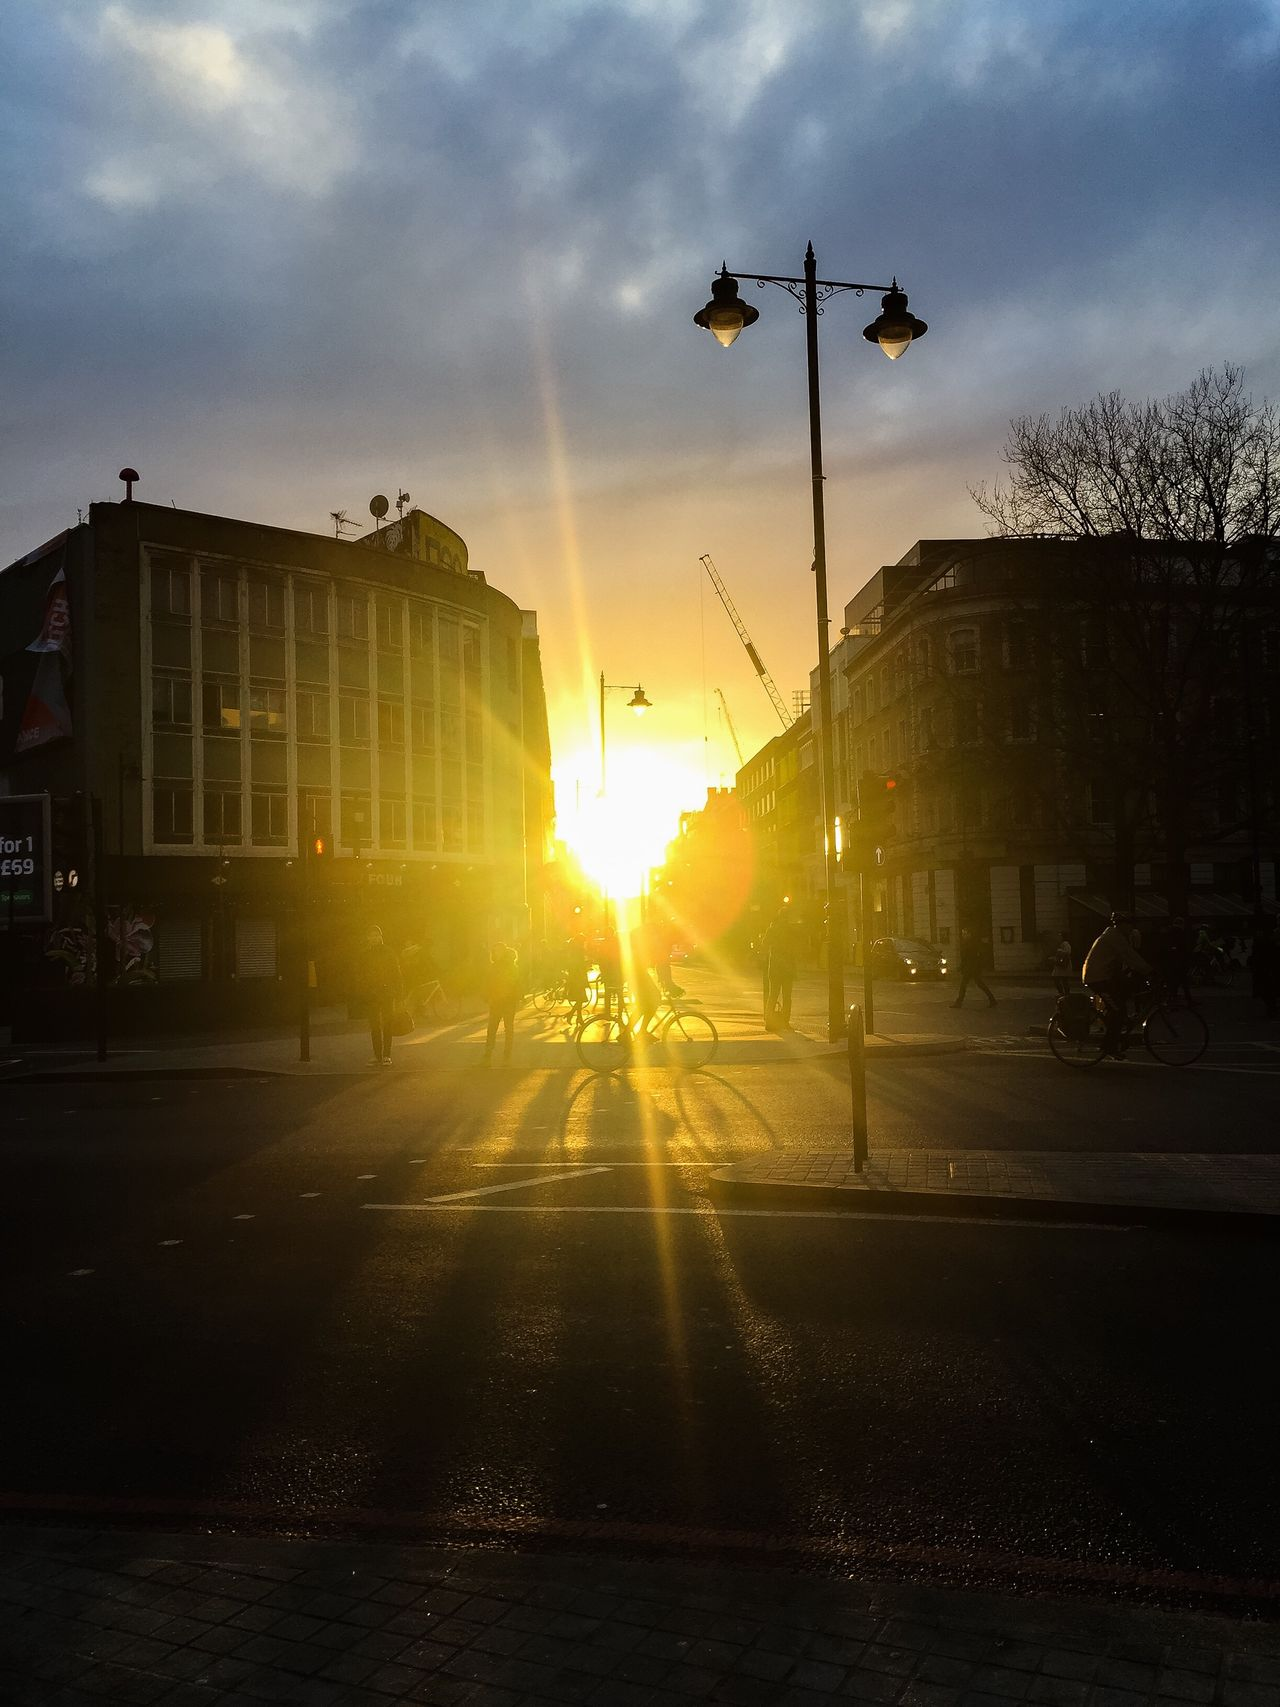 Sunlight Lens Flare Sunbeam Silhouette Transportation City Sunrise Shoreditch Shoreditch, London LONDON❤ Henge  The City Light On The Way To Work IPhoneography